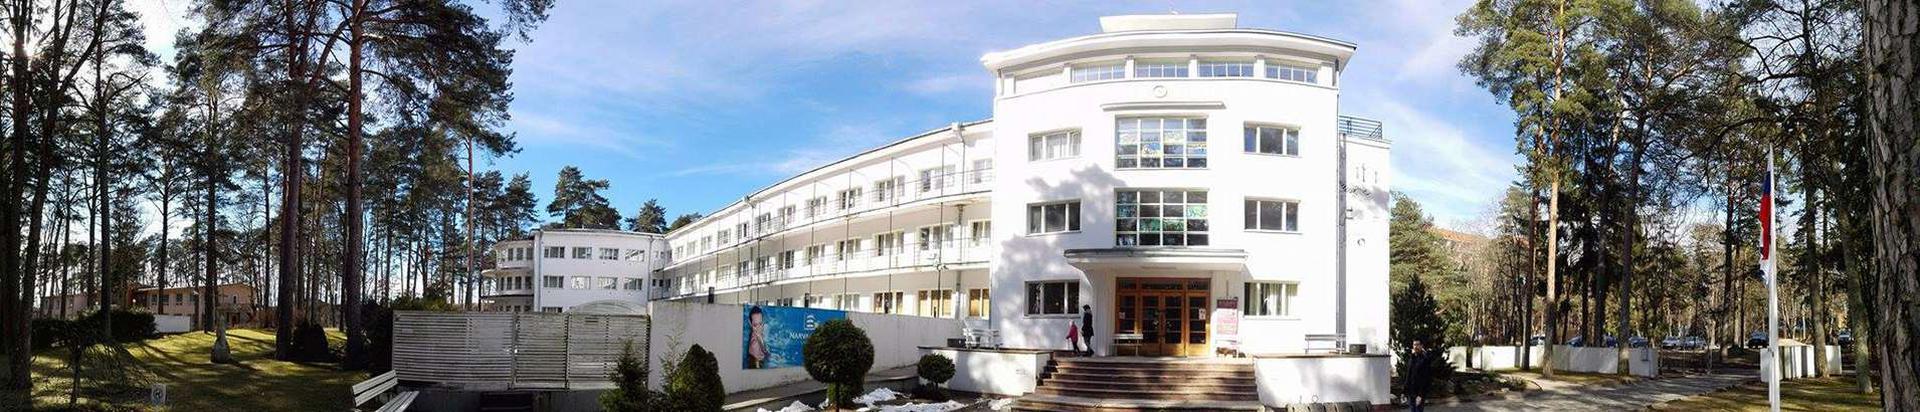 10228767_narva-joesuu-sanatoorium-as_30397318_xl.jpg